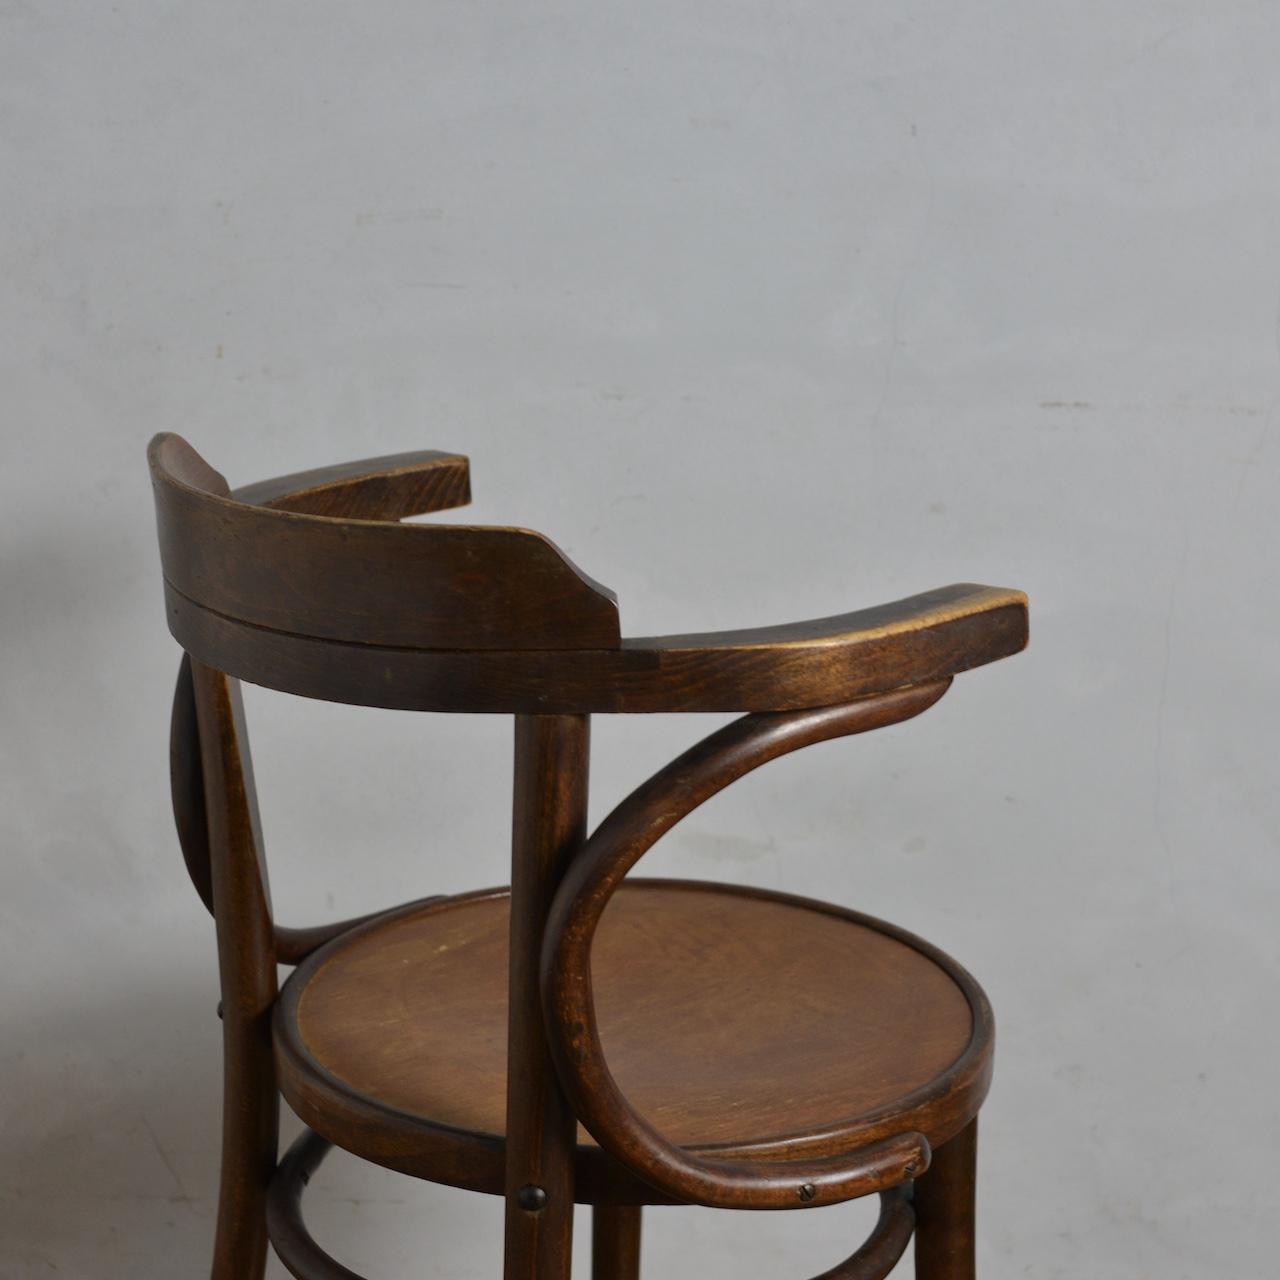 Bentwood Arm Chair【A】 / ベントウッド アーム チェア 〈ダイニングチェア・デスクチェア〉